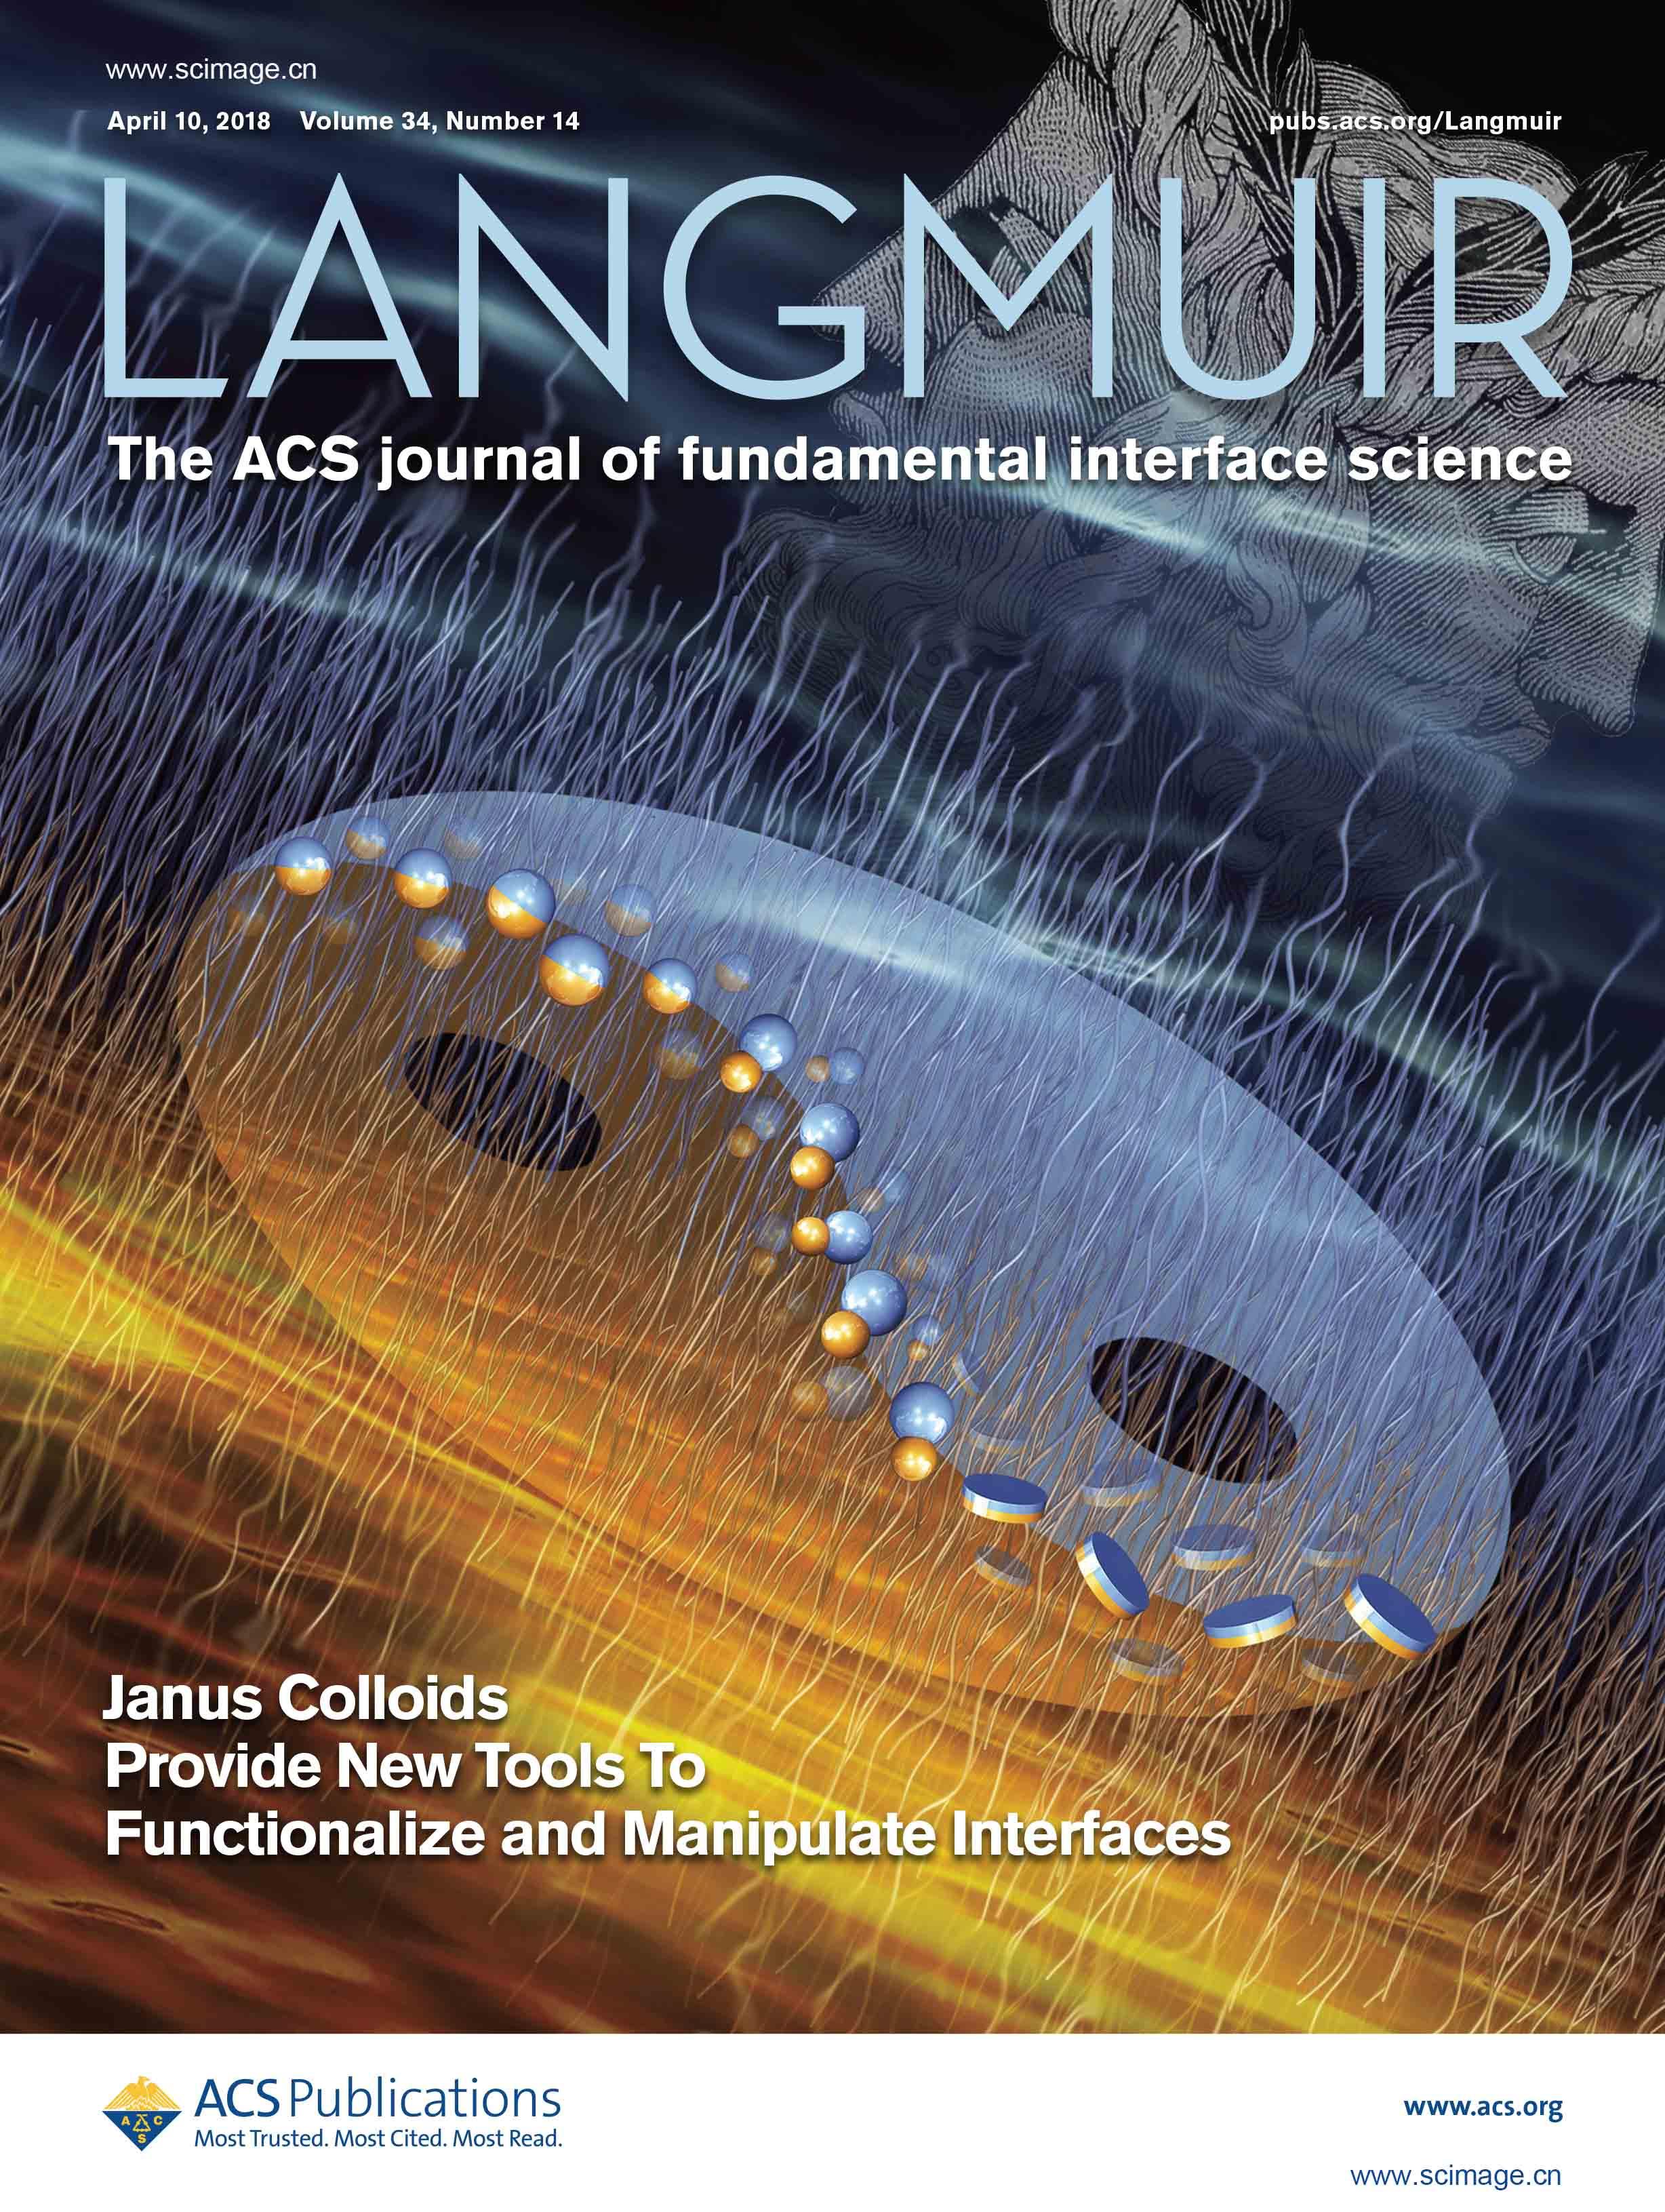 Janus Colloids toward Interfacial Engineering